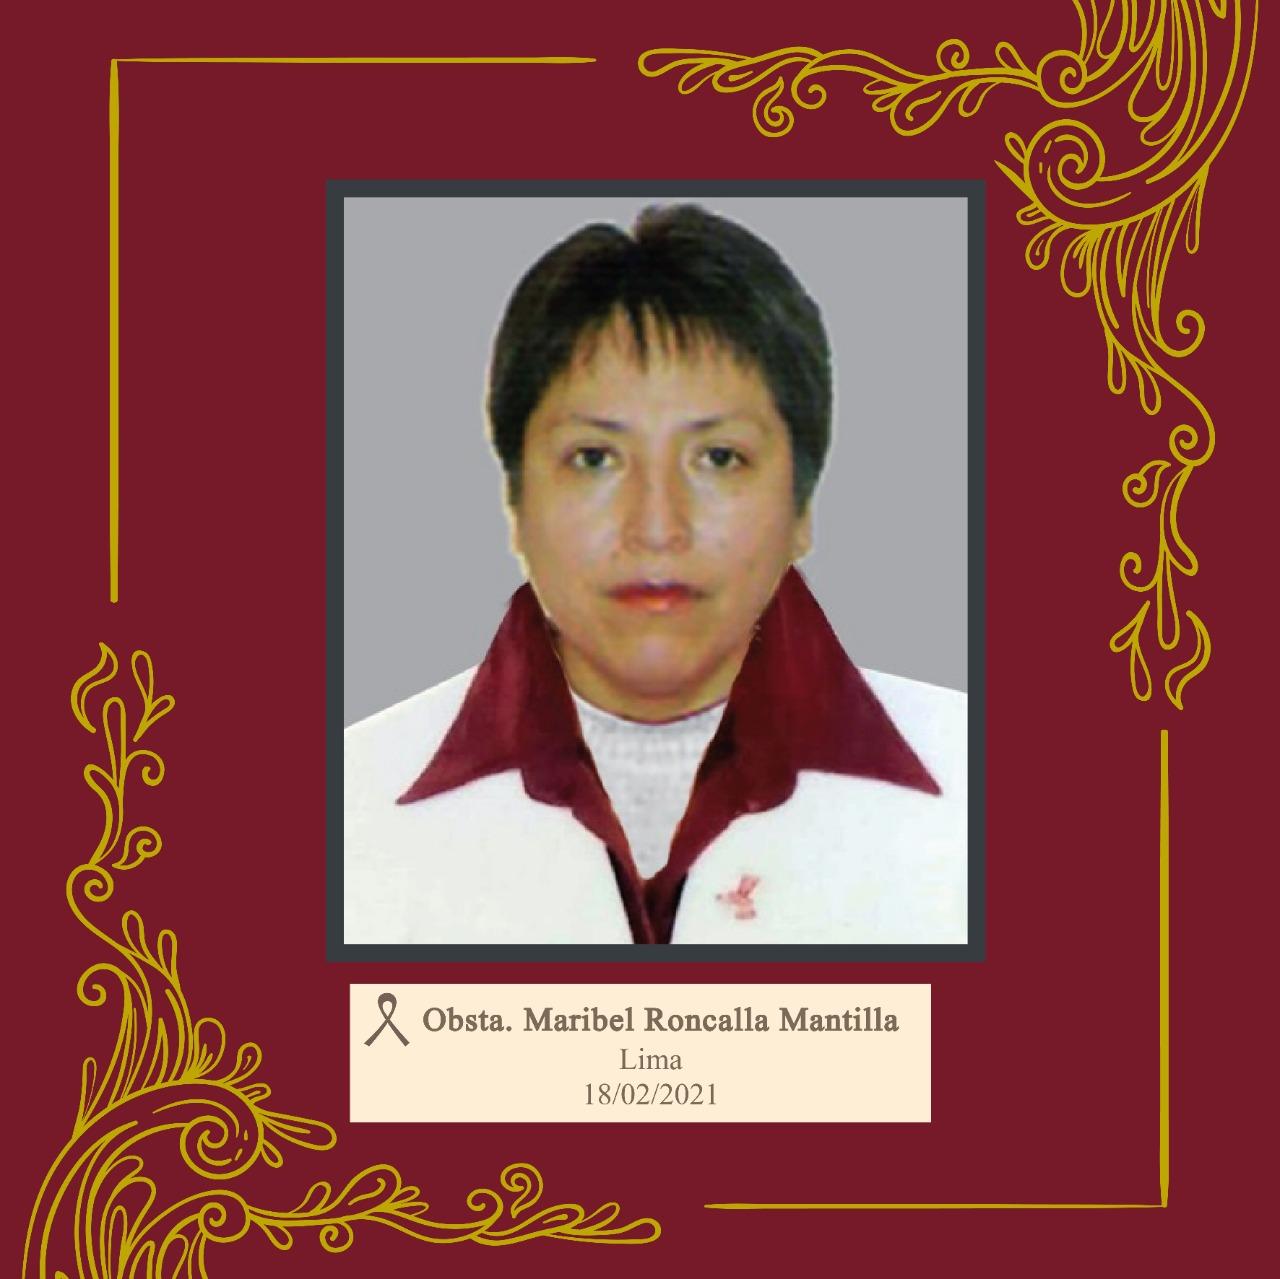 Maribel Roncalla Mantilla